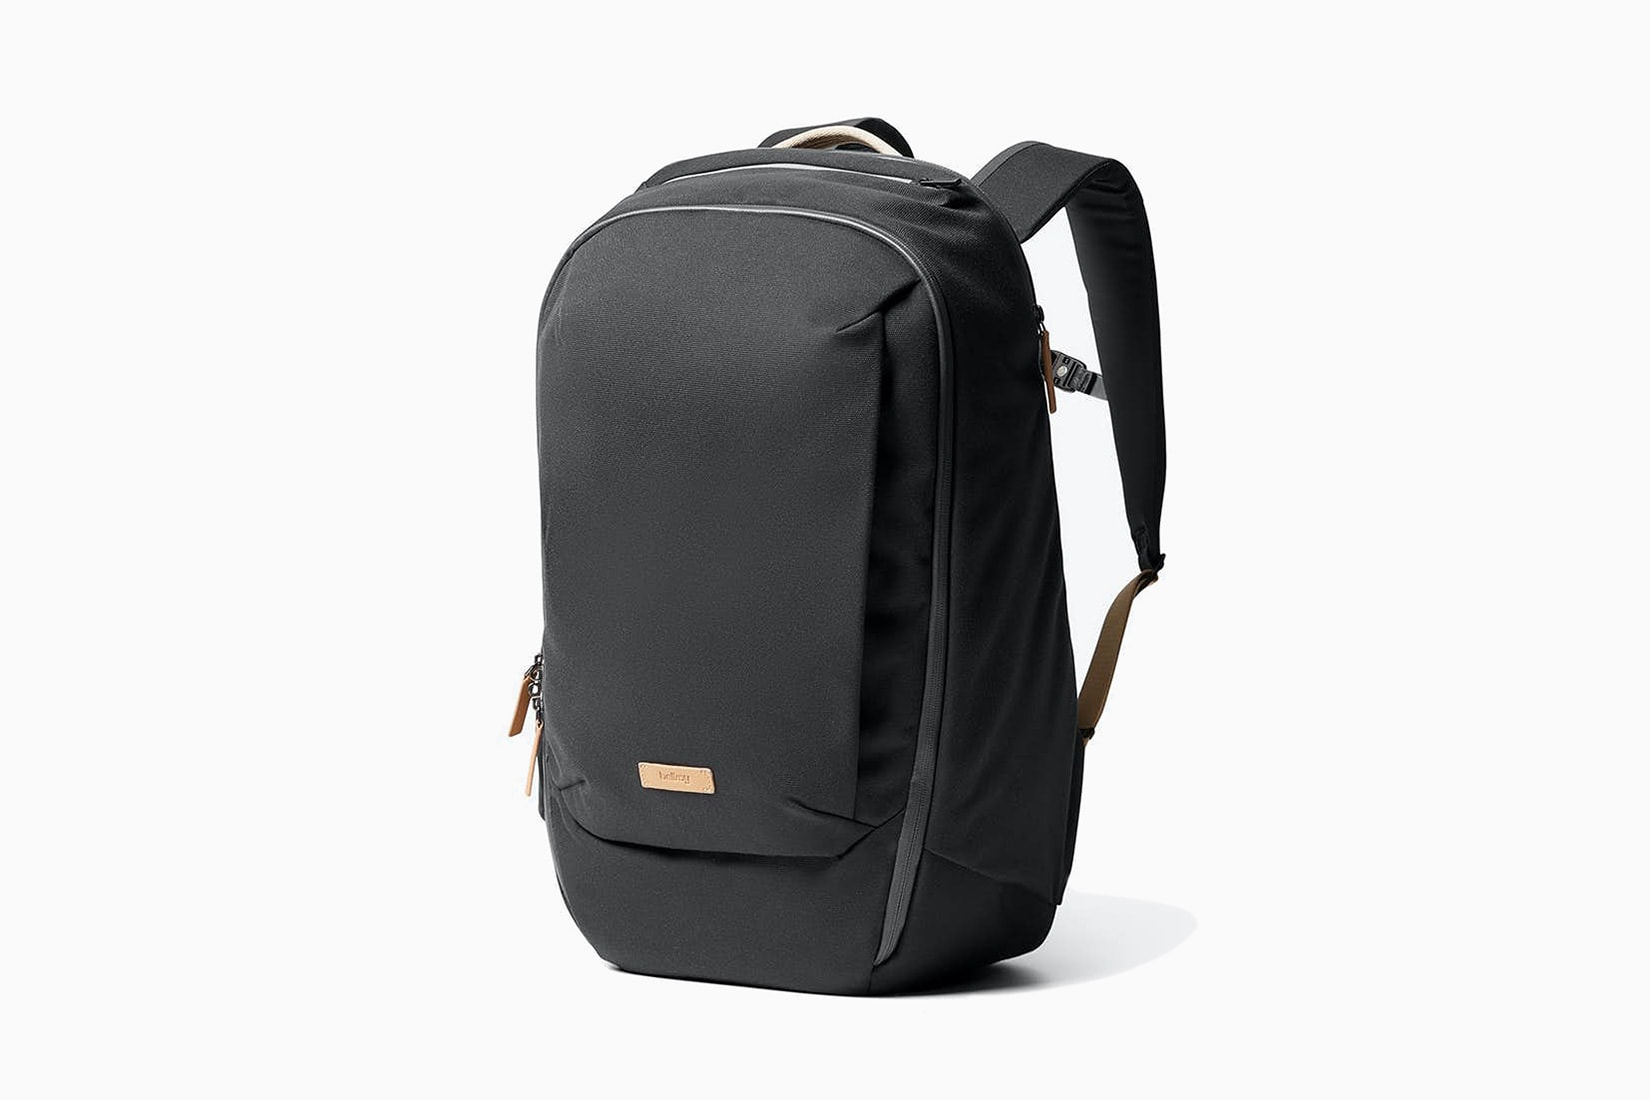 best edc backpack weekend bellroy transit plus review - Luxe Digital